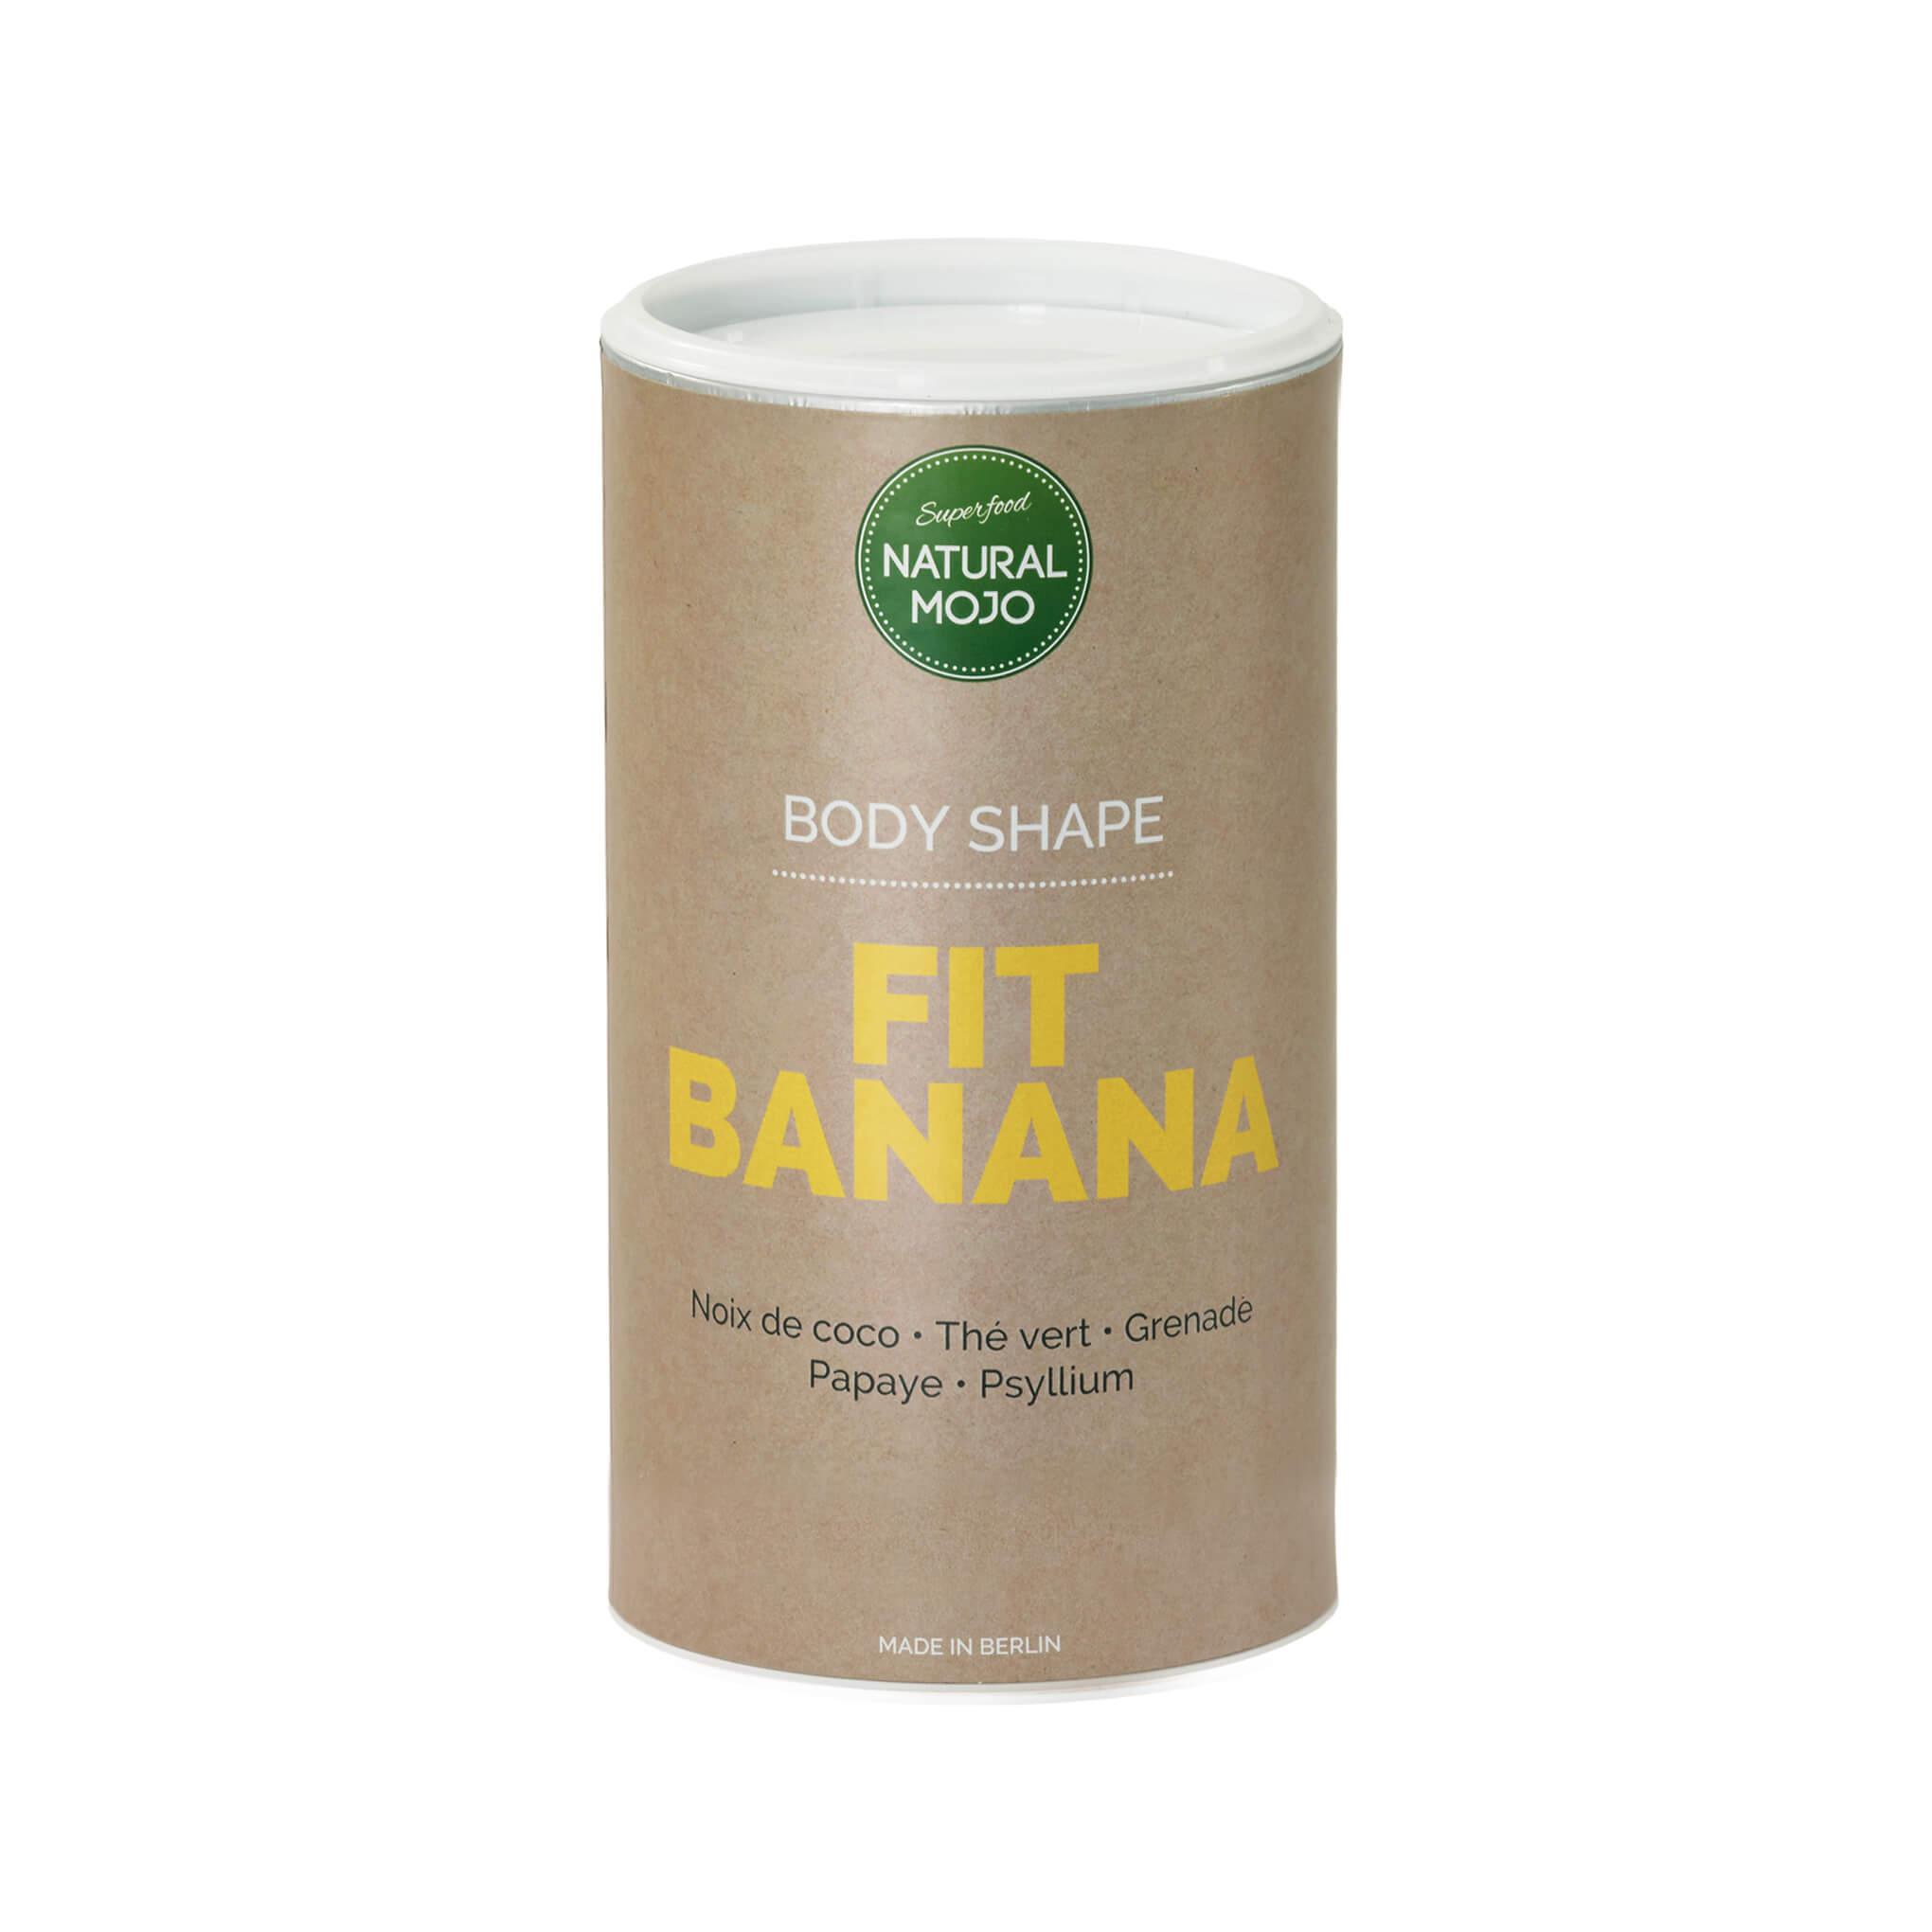 fit-banana-fr_2040x2040